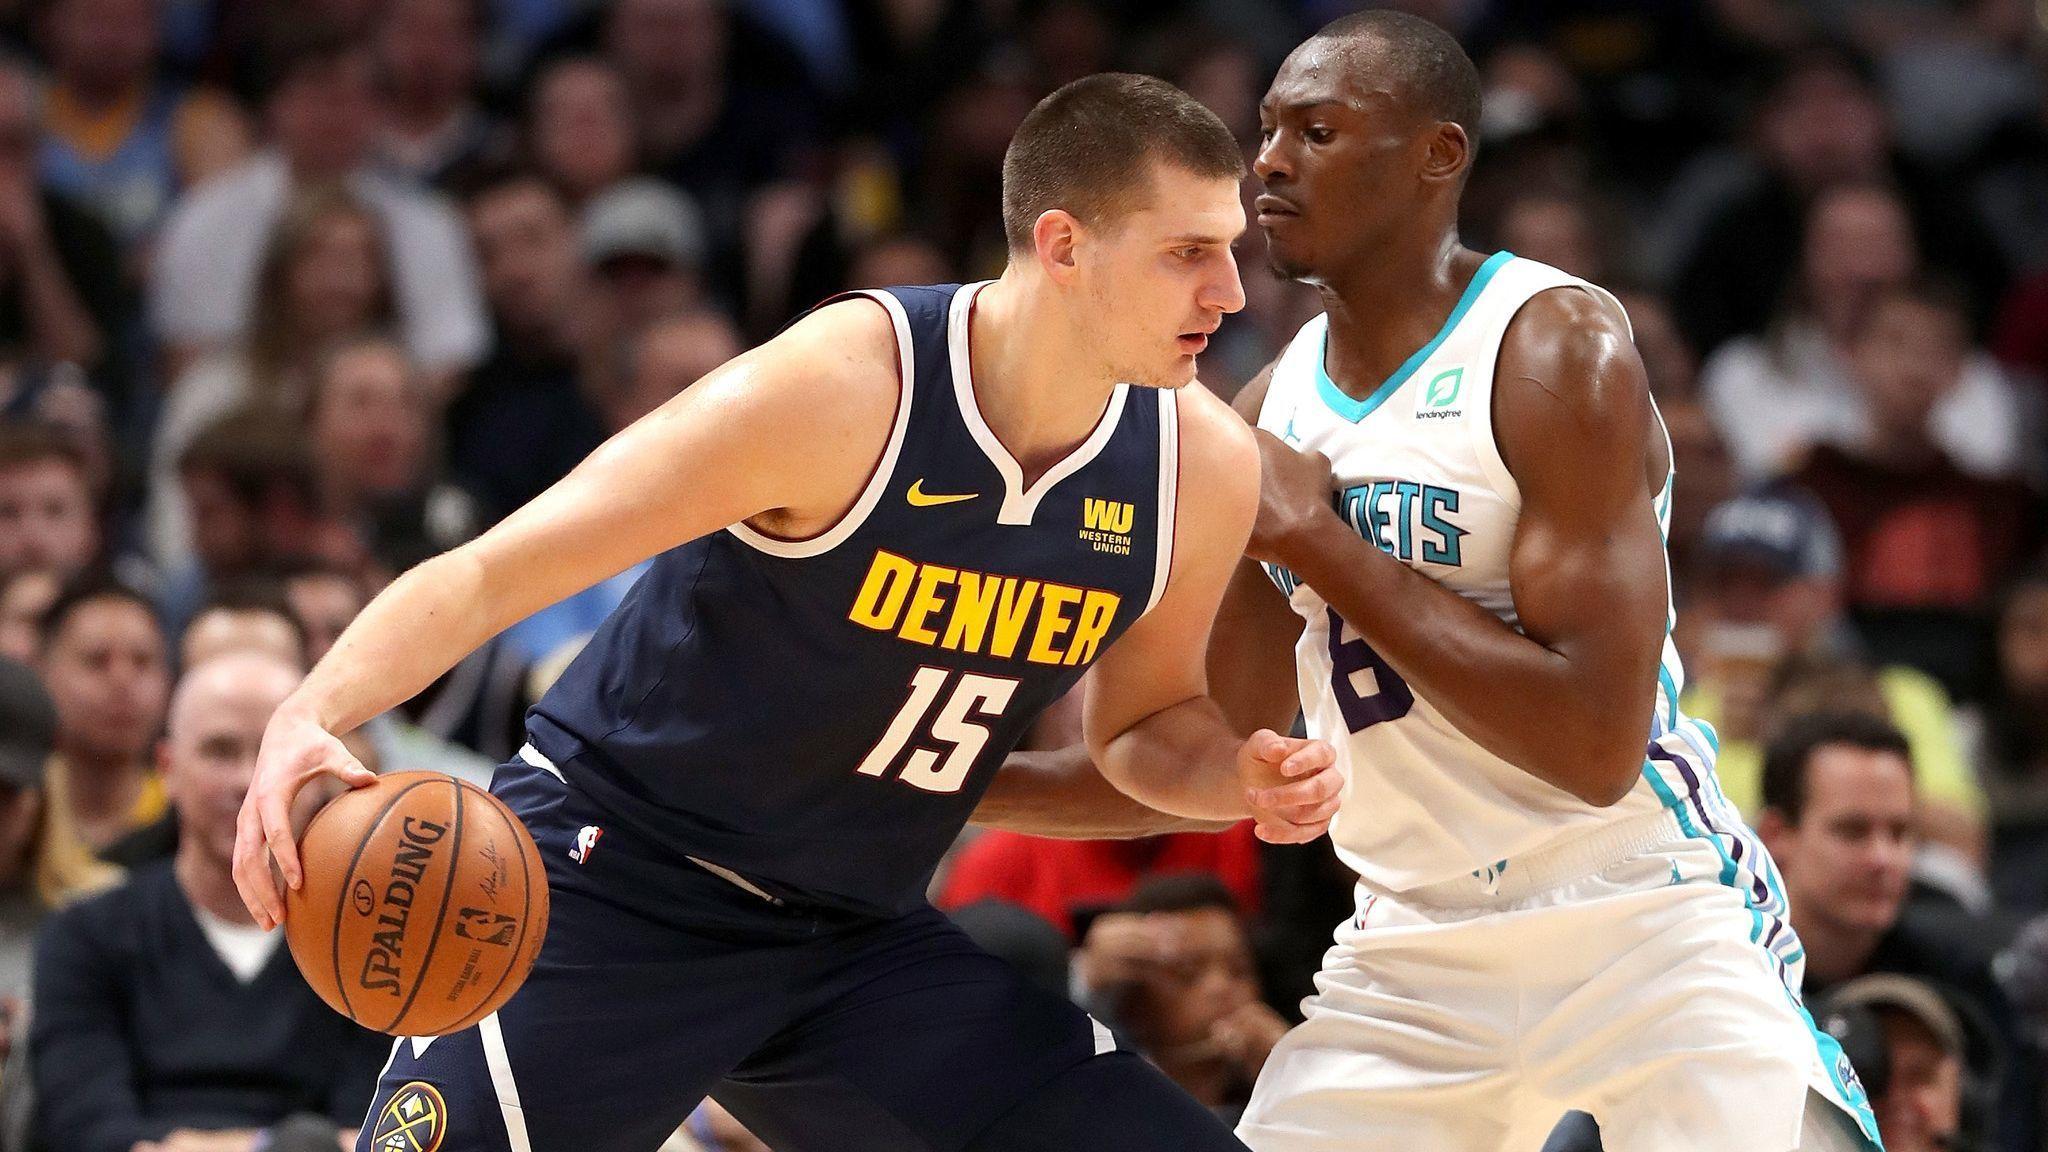 NBA: Nikola Jokic has season-high 39 points, Nuggets top Hornets